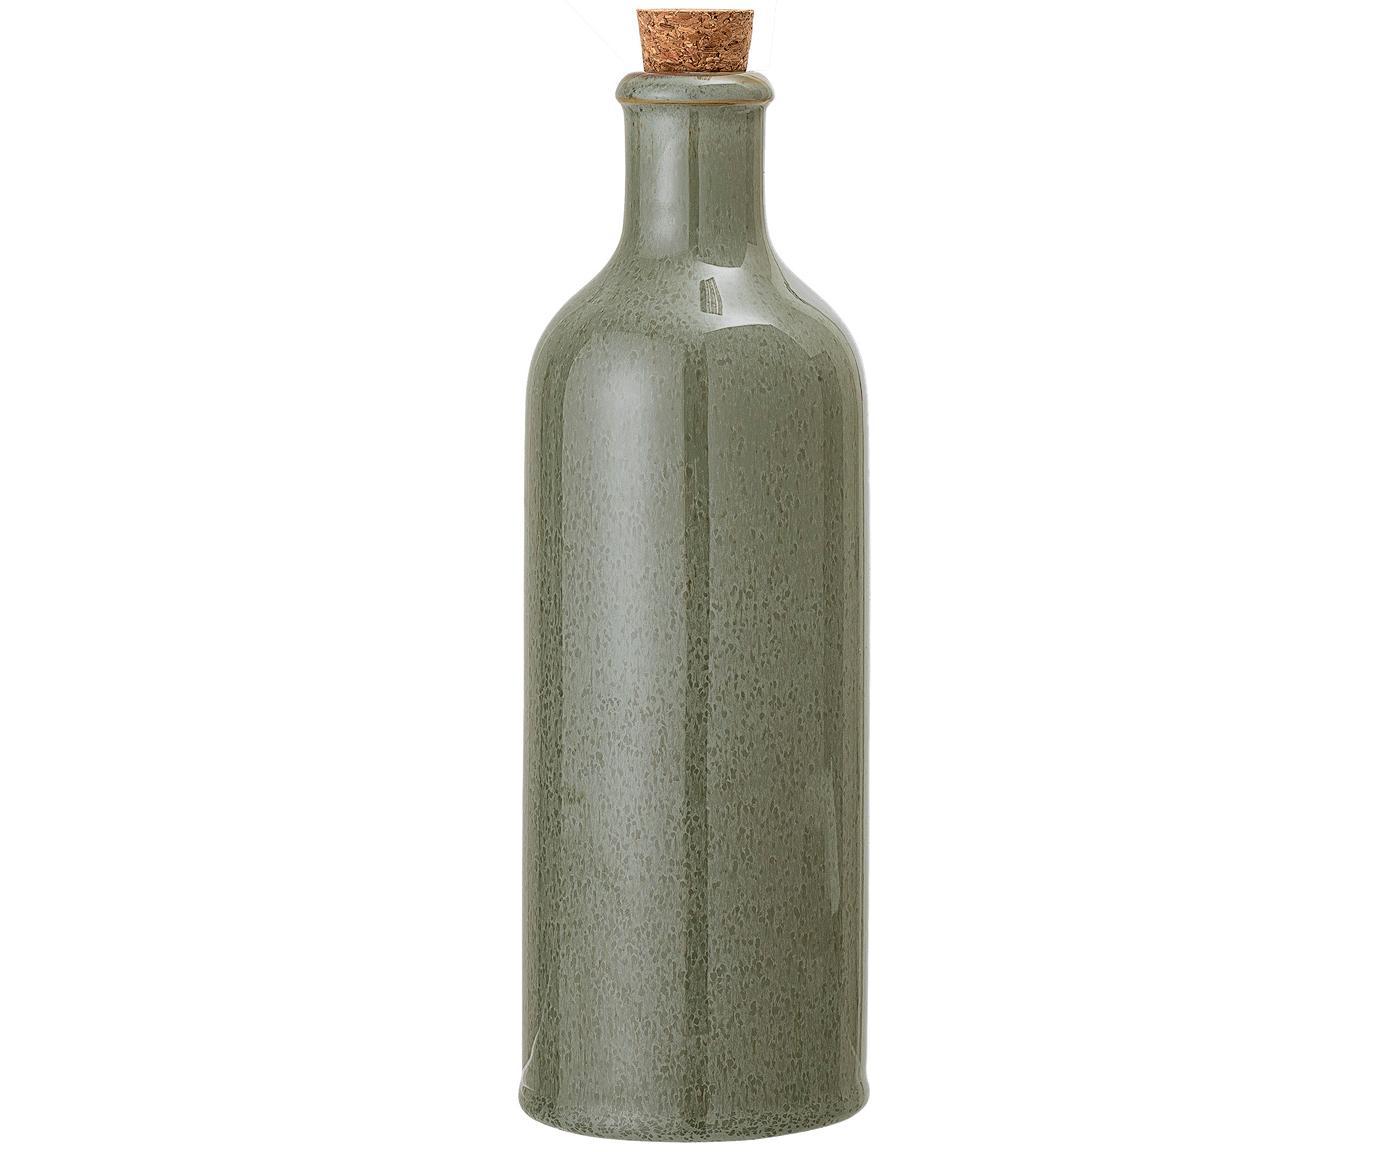 Aceitera o vinagrera Pixie, Botella: gres, Verde, Ø 8 x Al 25 cm